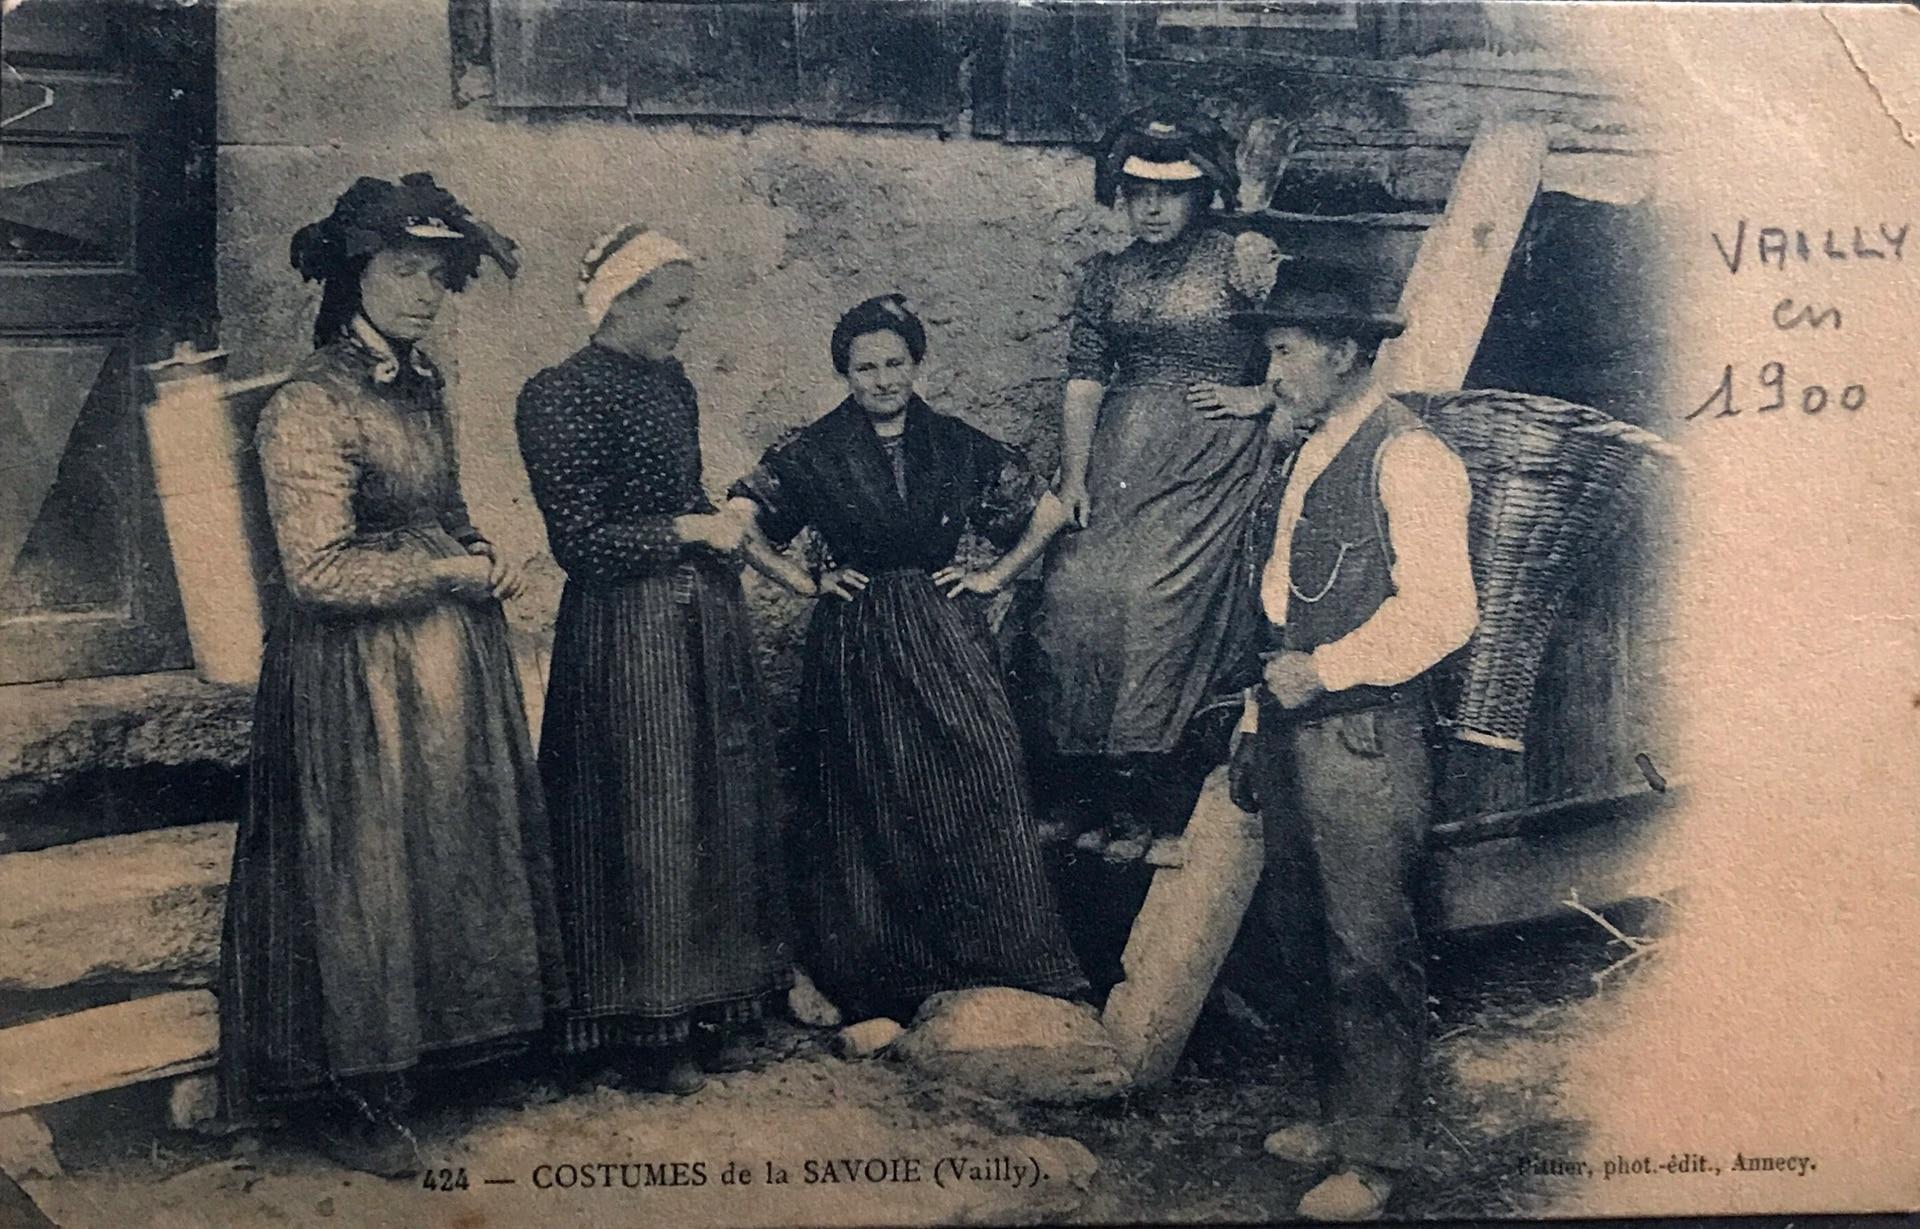 Suizos de Vally. Hacia 1900. Varios migraron a Entre Ríos.